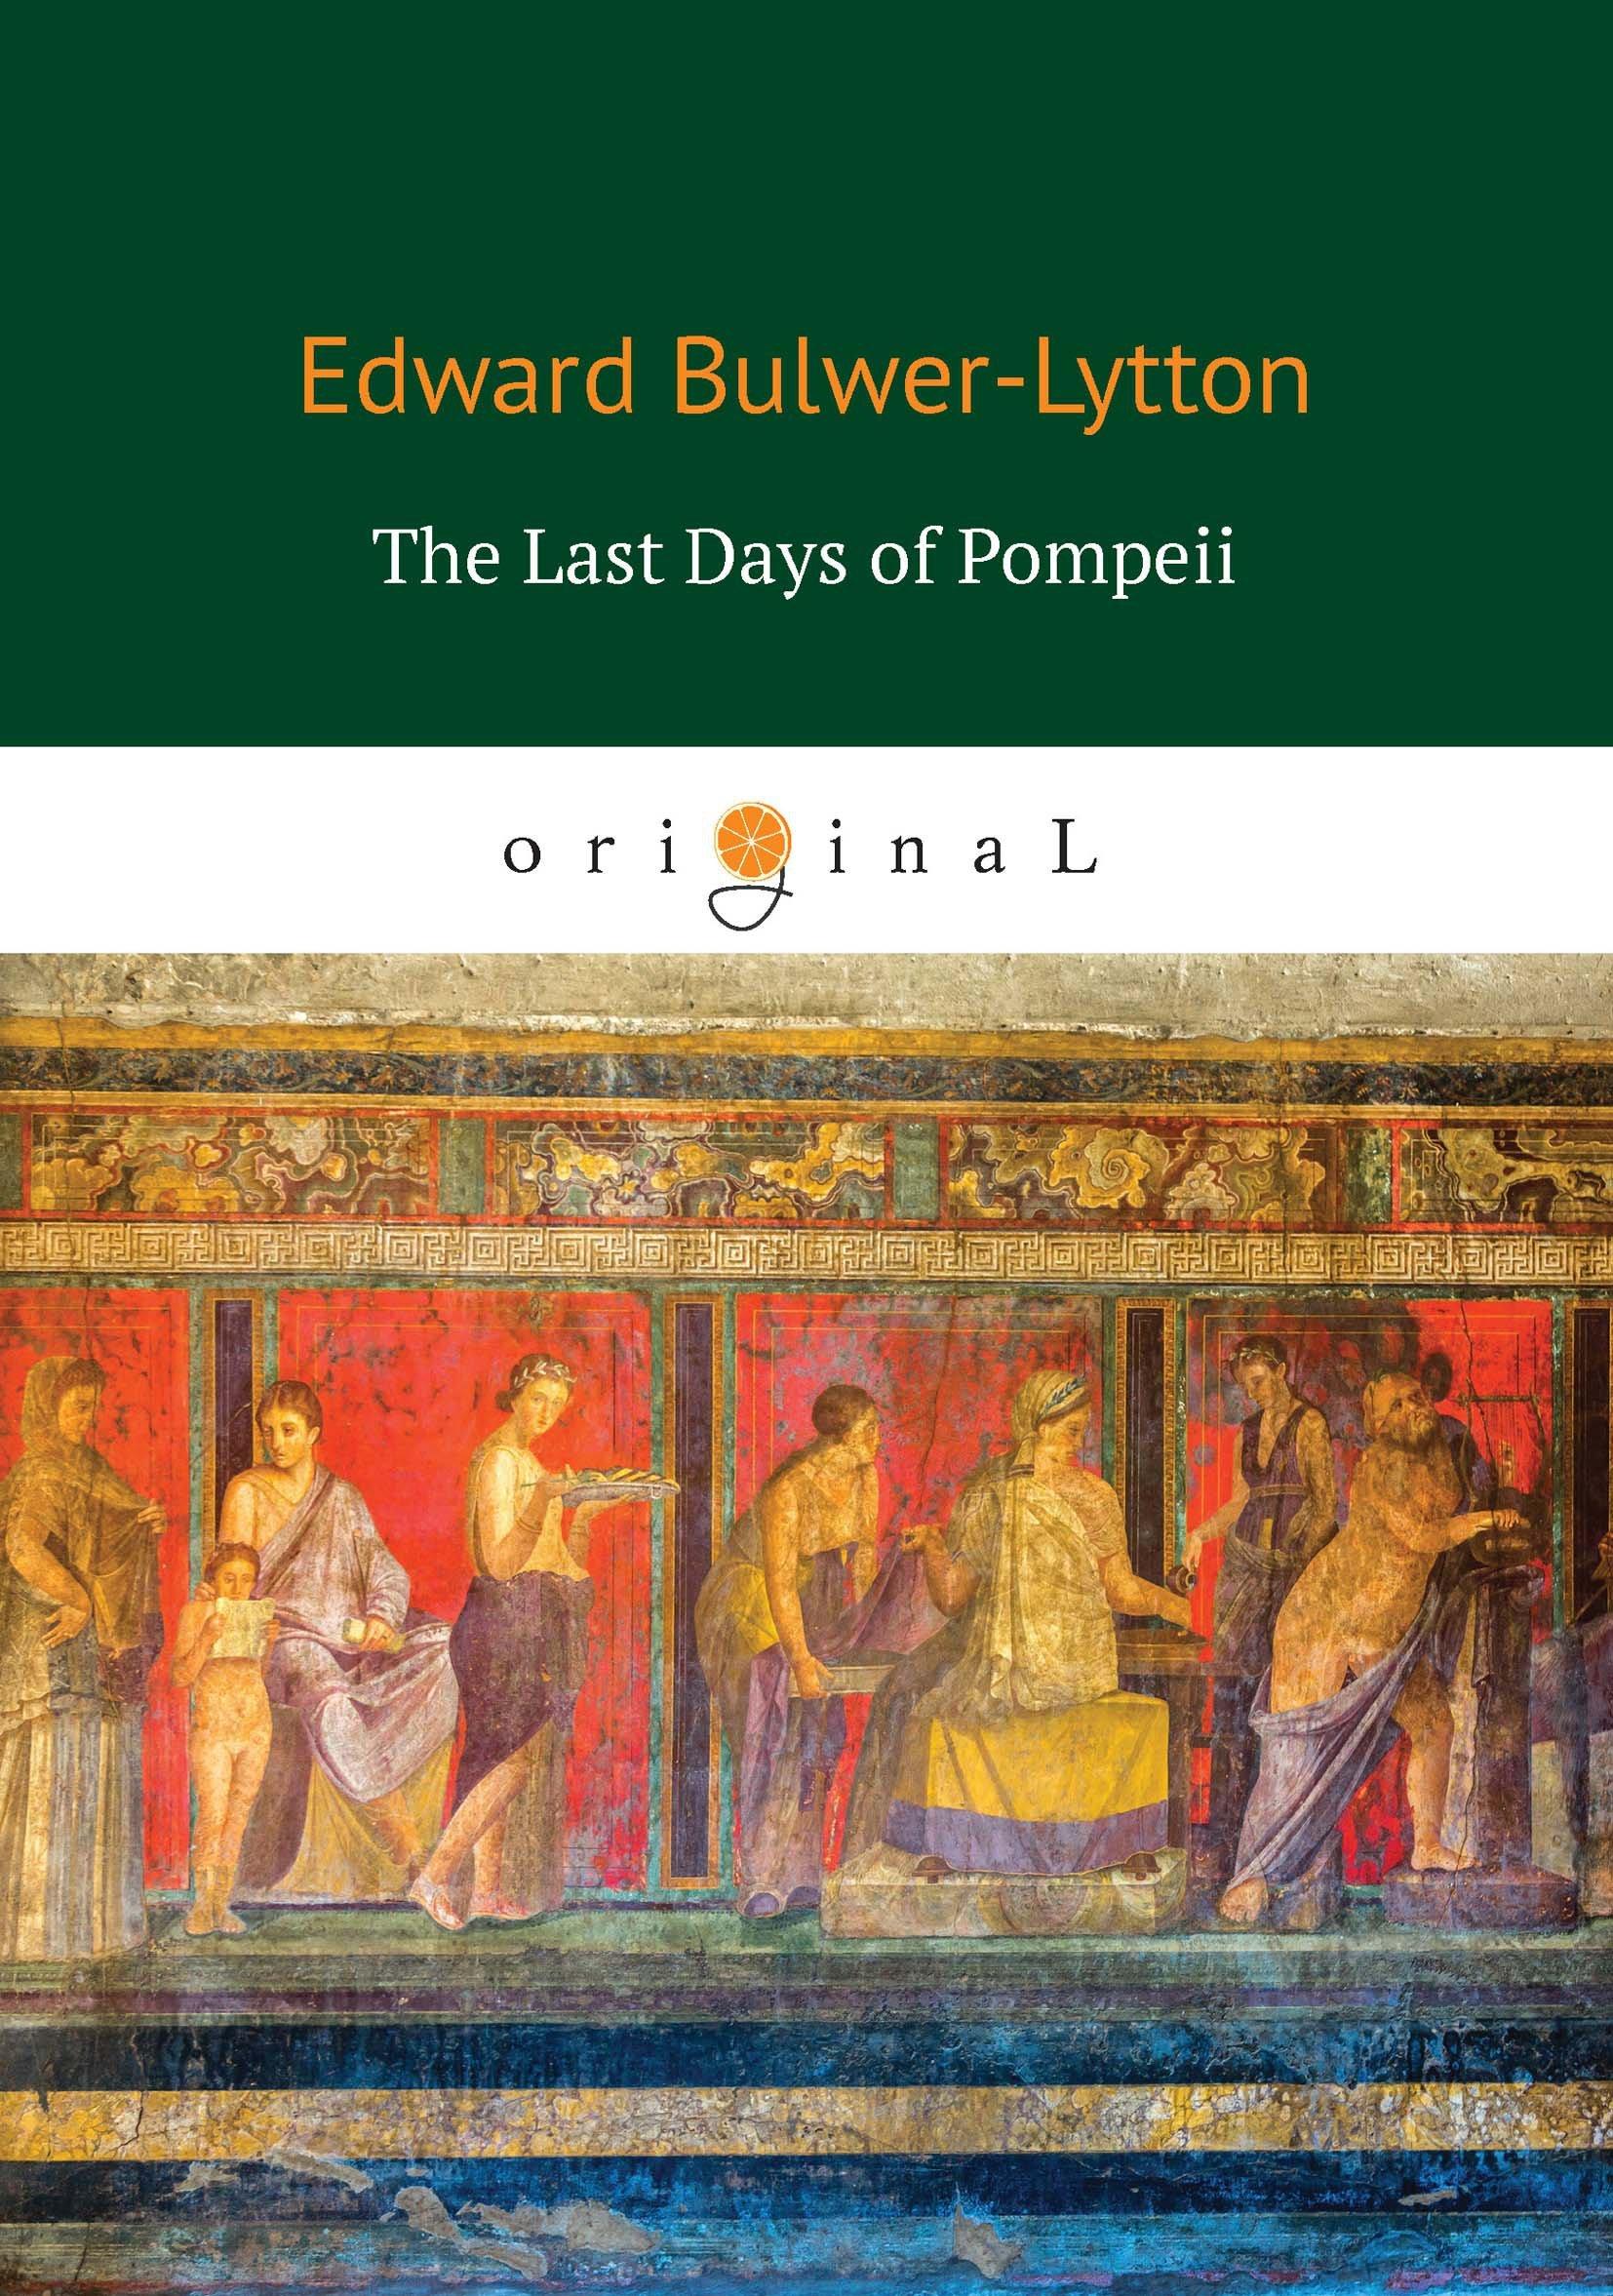 Бульвер-Литтон Эдвард The Last Days of Pompeii = Последние дни Помпеи: на англ.яз sean dixon the last days of the lacuna cabal